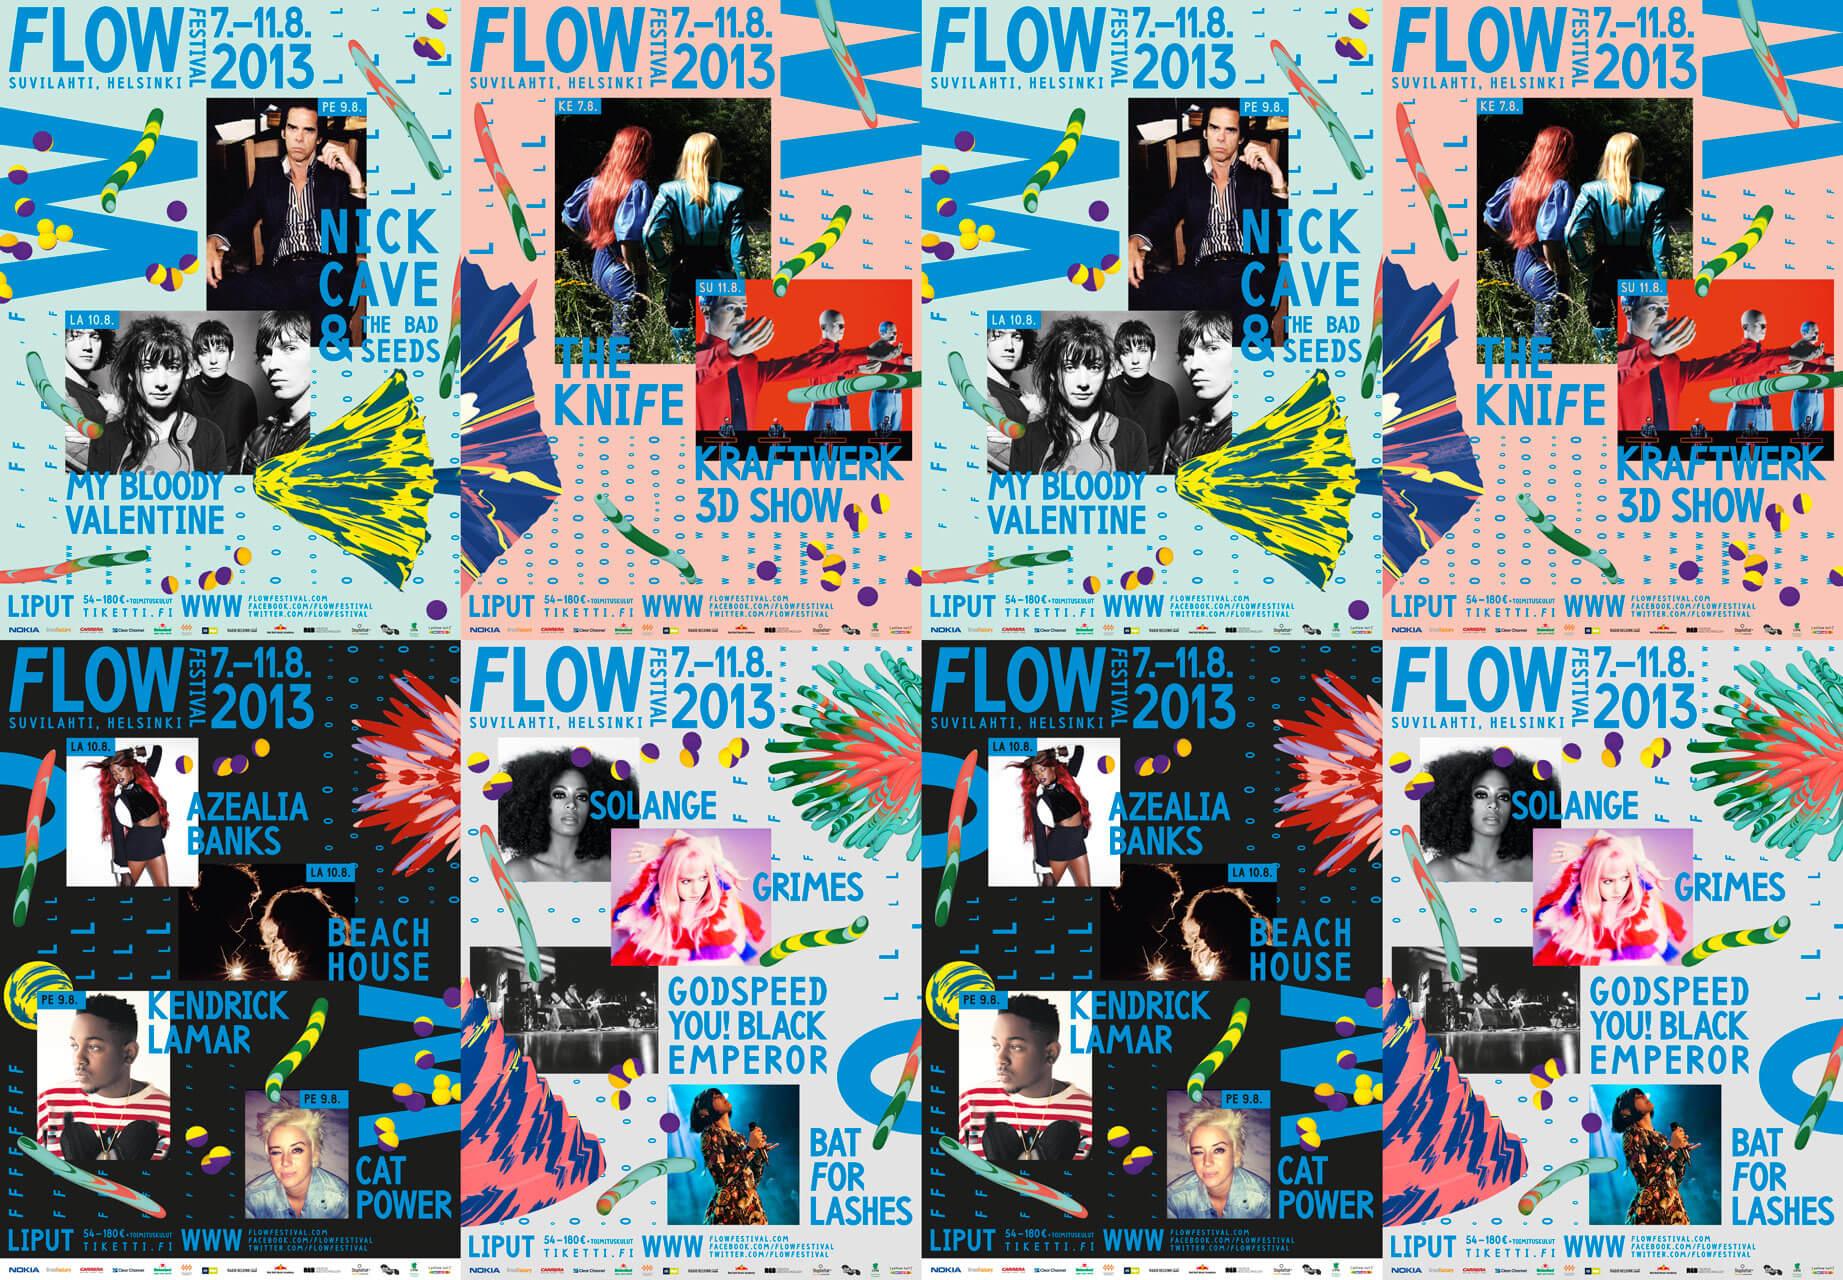 Tomi_Bjorck_Flowfestival_2.jpg